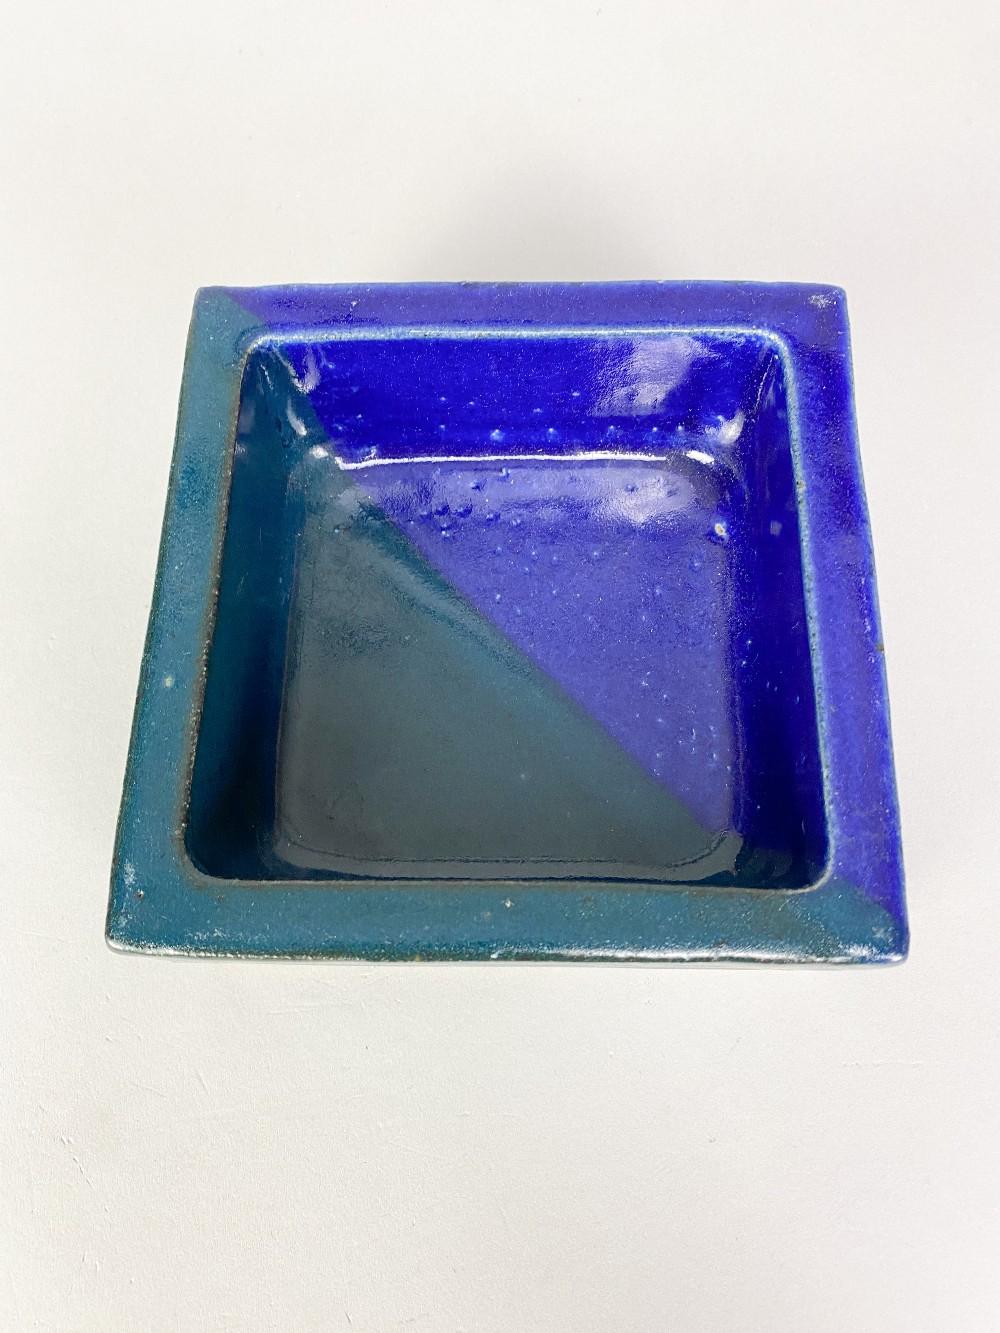 IAN AULD (1926-2000); a square dish covered in dark turquoise and indigo glaze, impressed IA mark, - Image 3 of 5